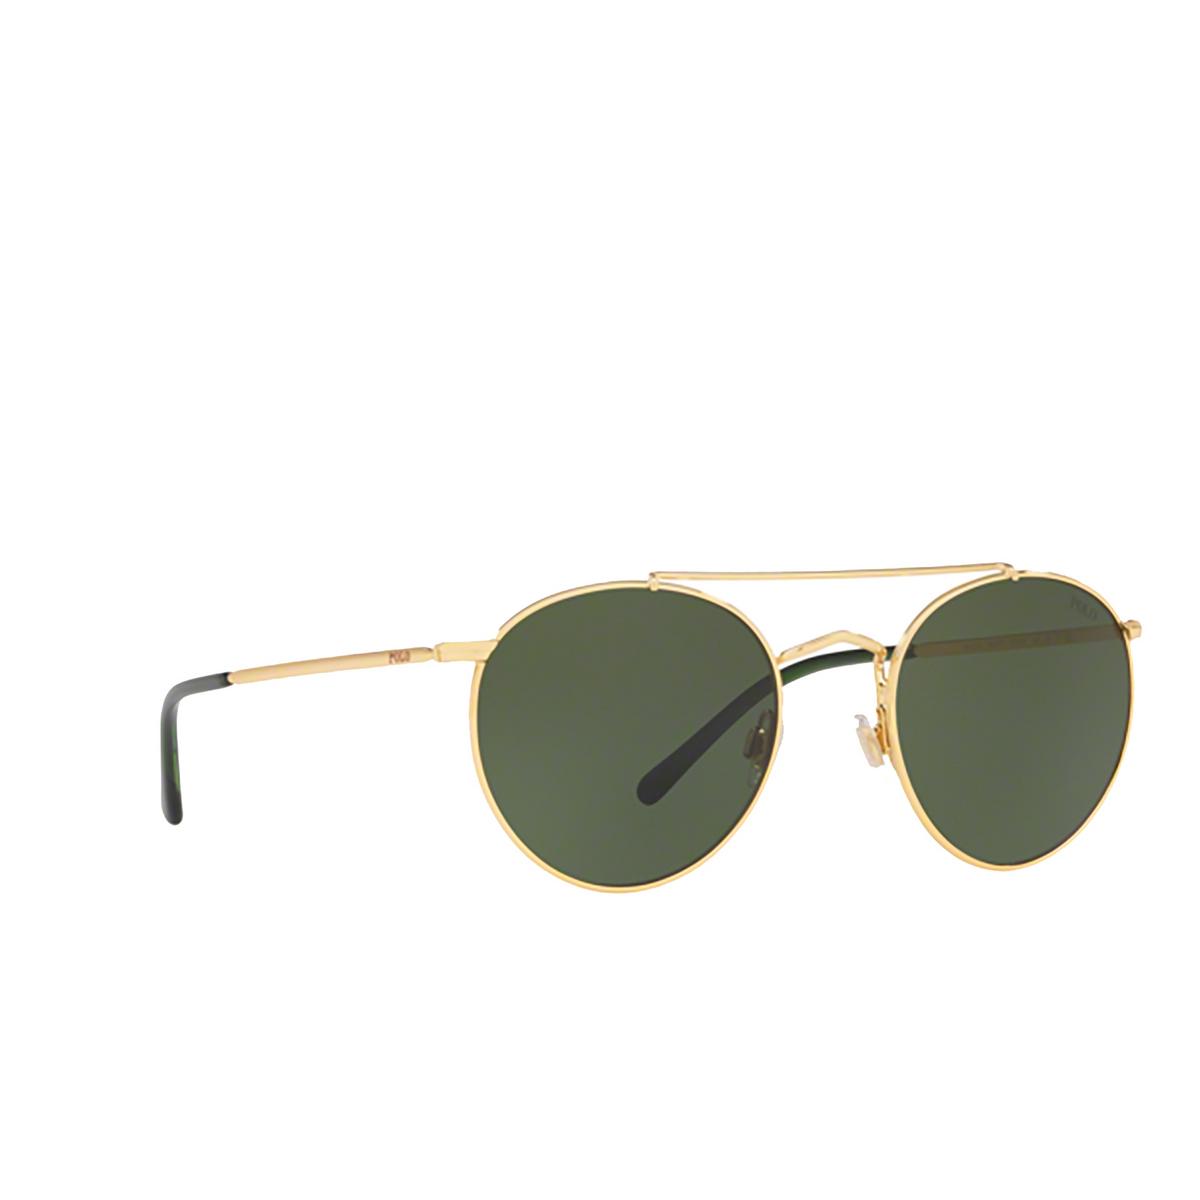 Polo Ralph Lauren® Round Sunglasses: PH3114 color Shiny Gold 900471.